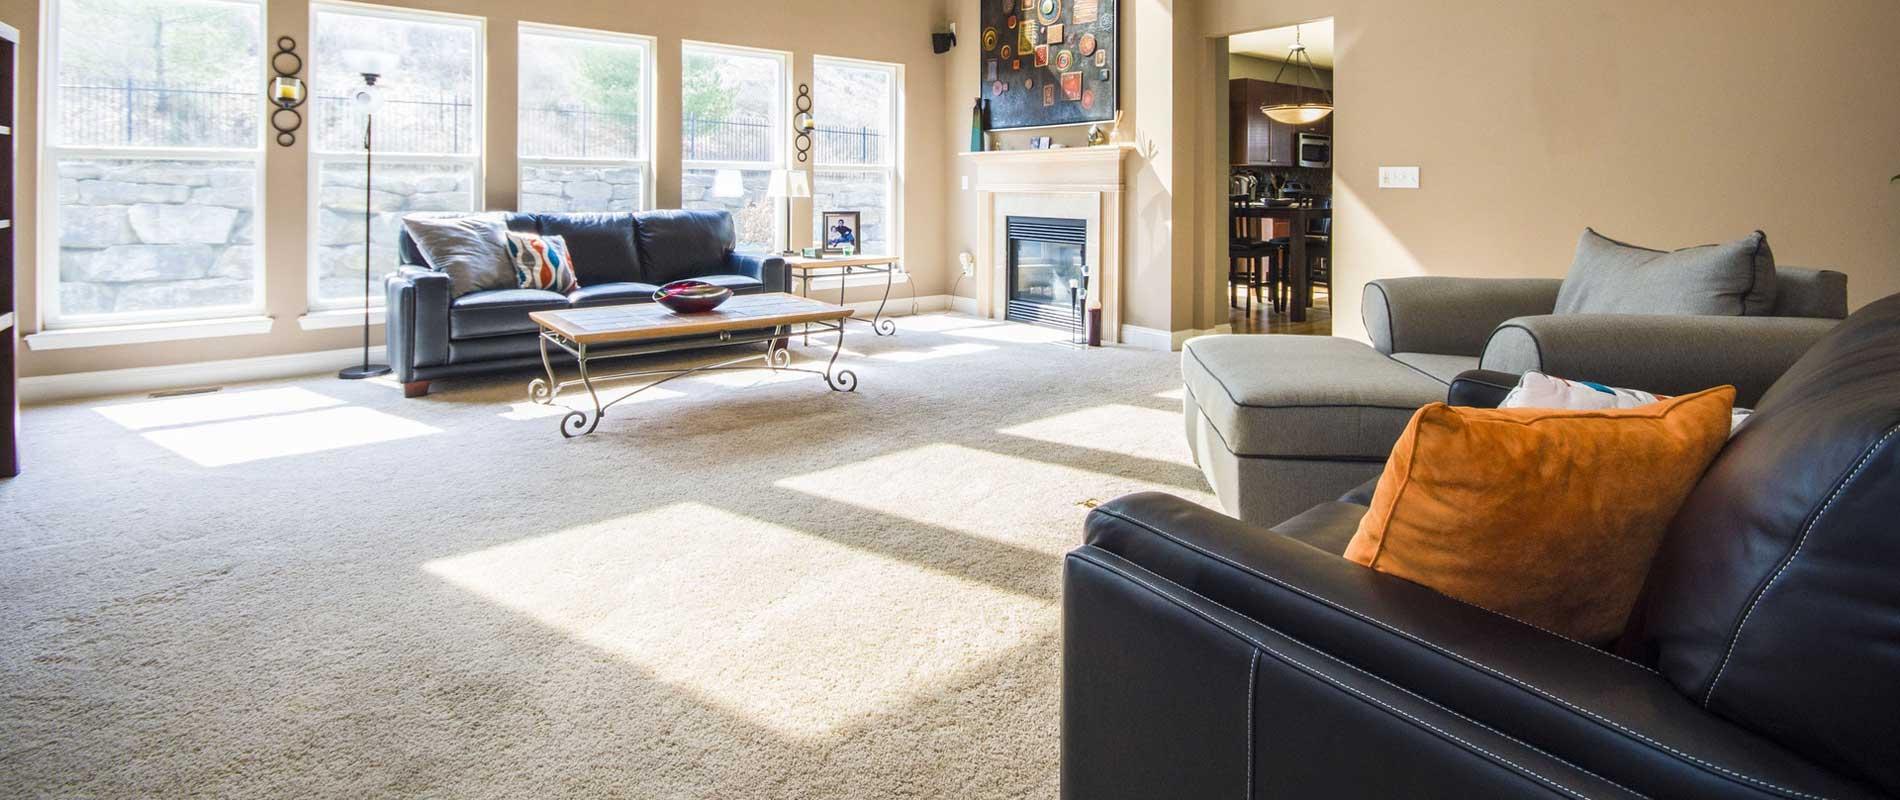 carpet supplier cardigan